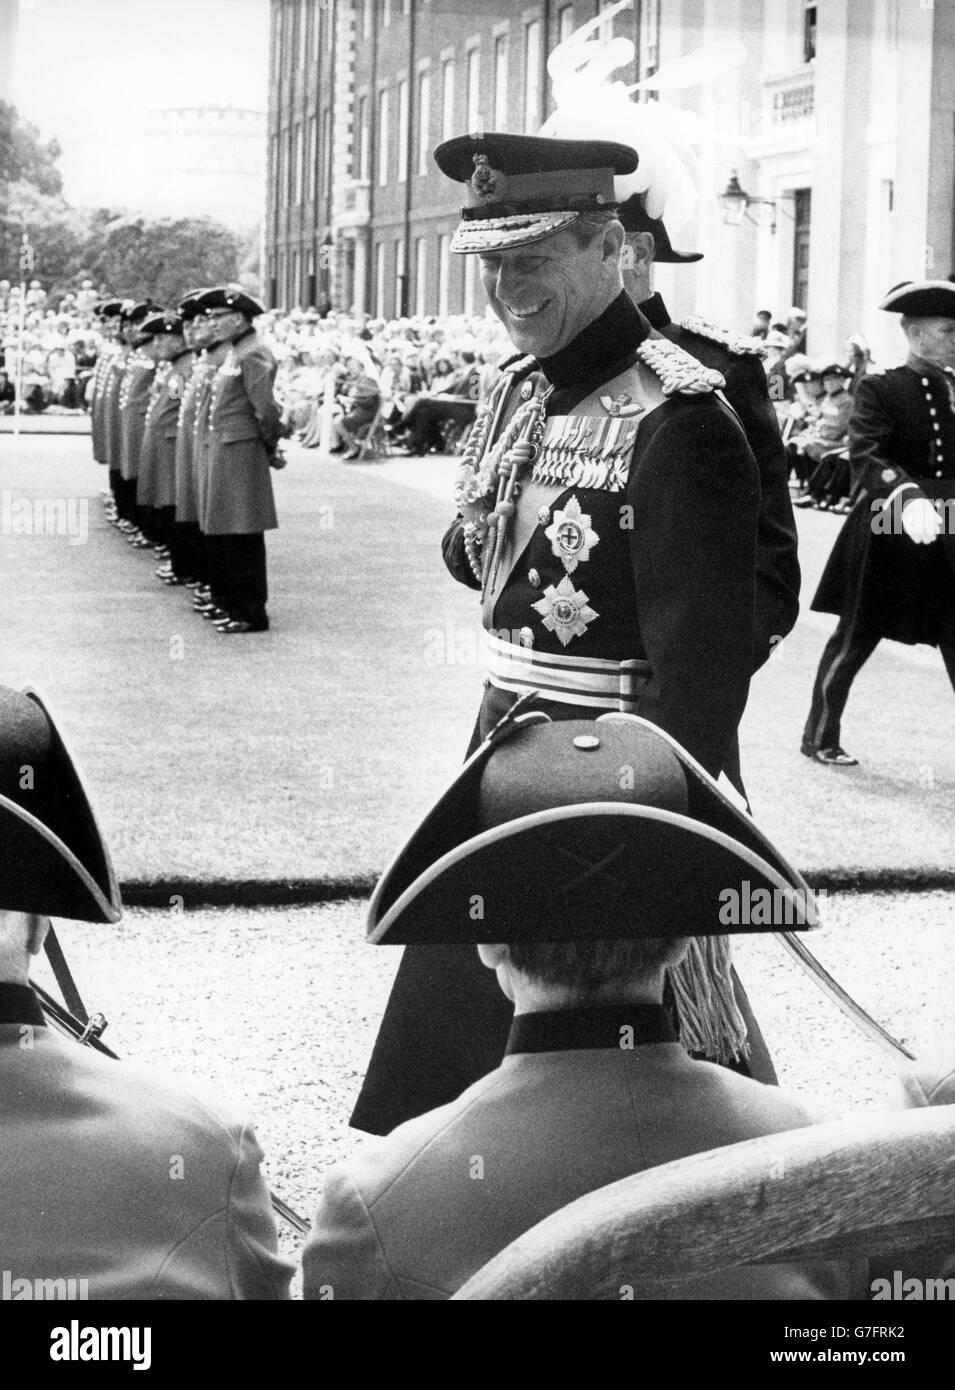 Royalty - Founder's Day Parade - Duke of Edinburgh - Royal Hospital - Chelsea, London - Stock Image